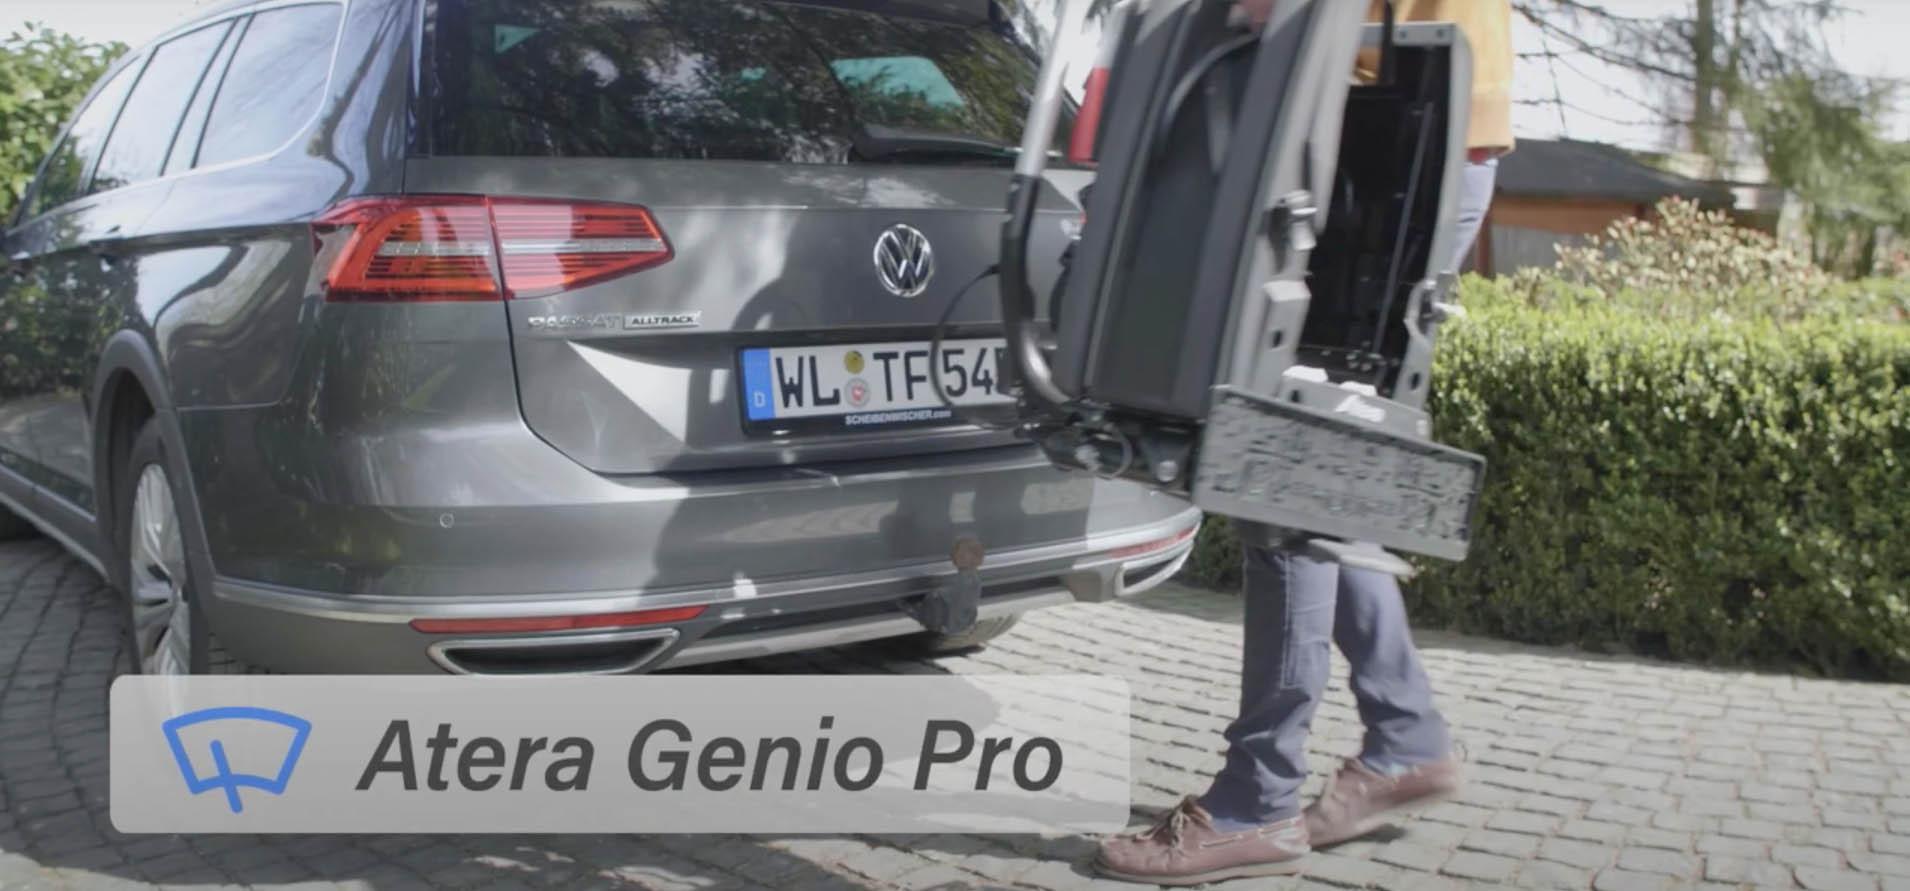 Atera Genio Pro